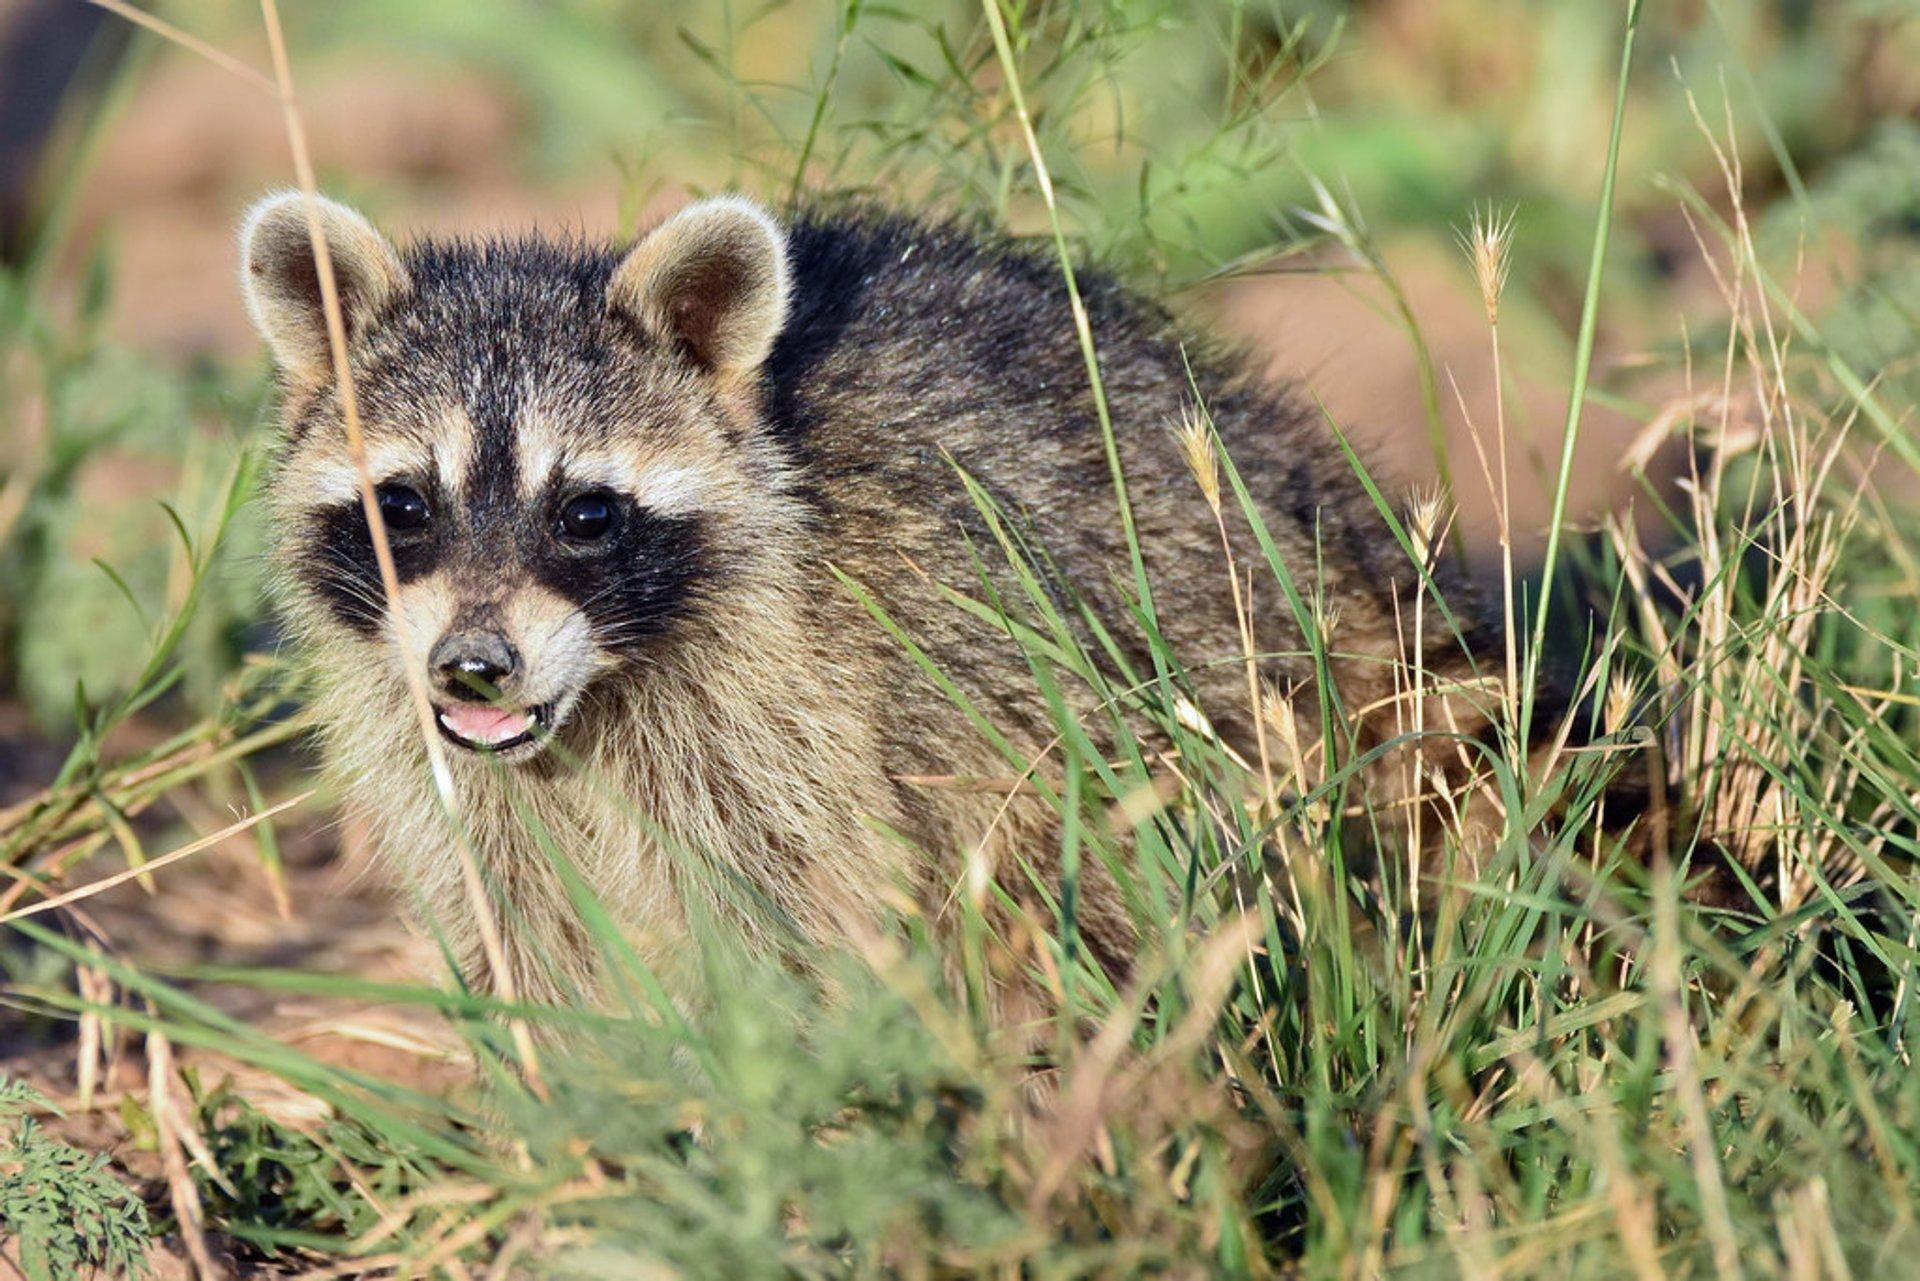 Raccoon in Texas - Best Season 2020